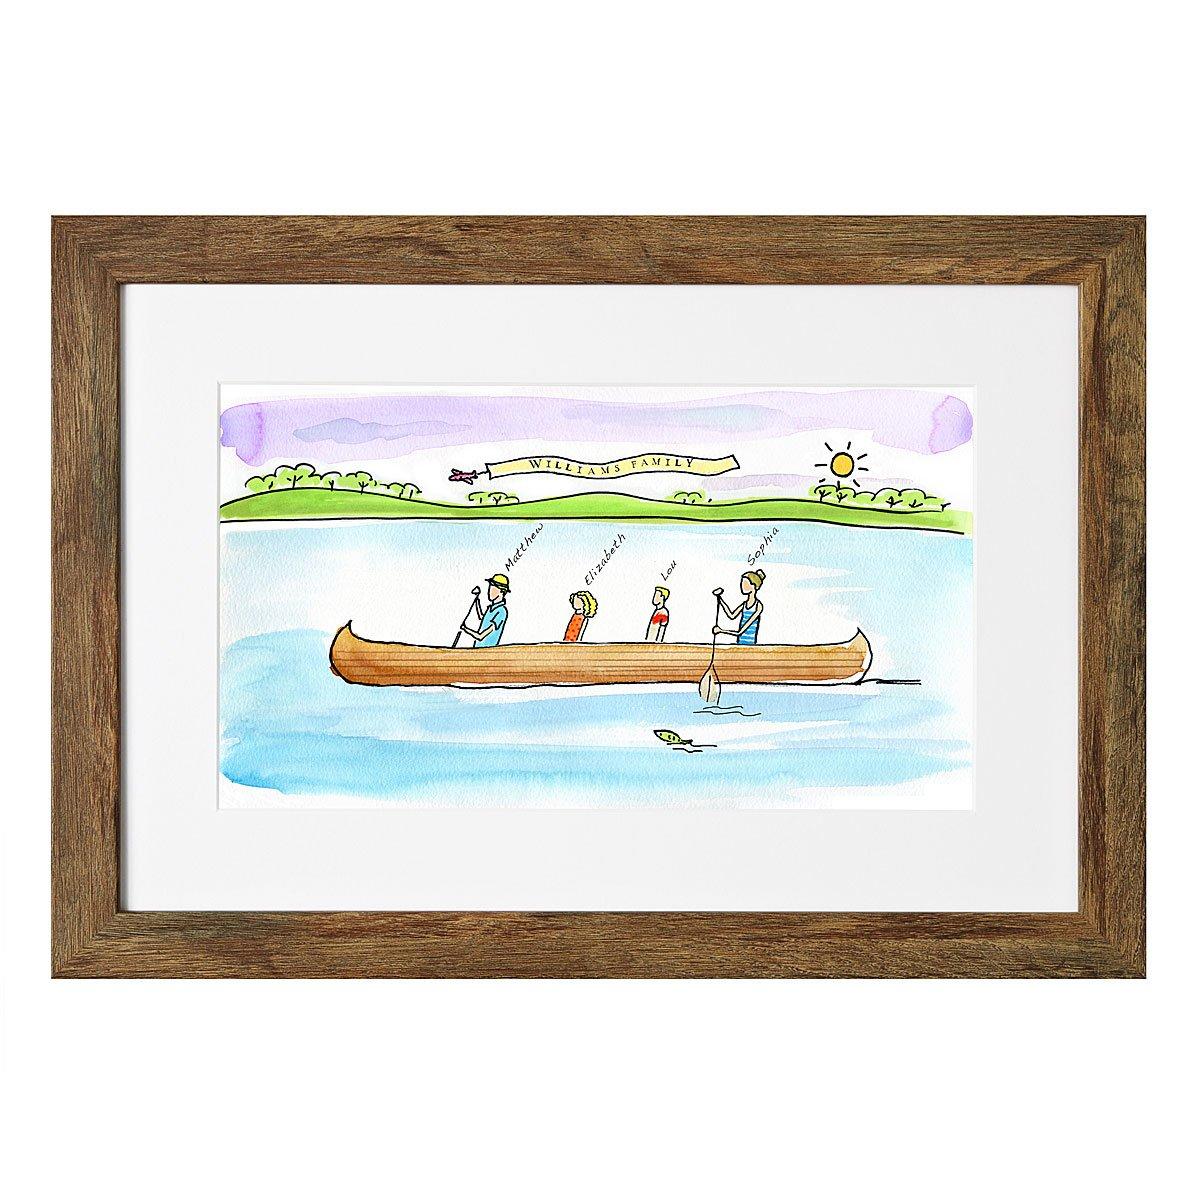 Personalized Family Canoe Art | personalized, custom, family ...